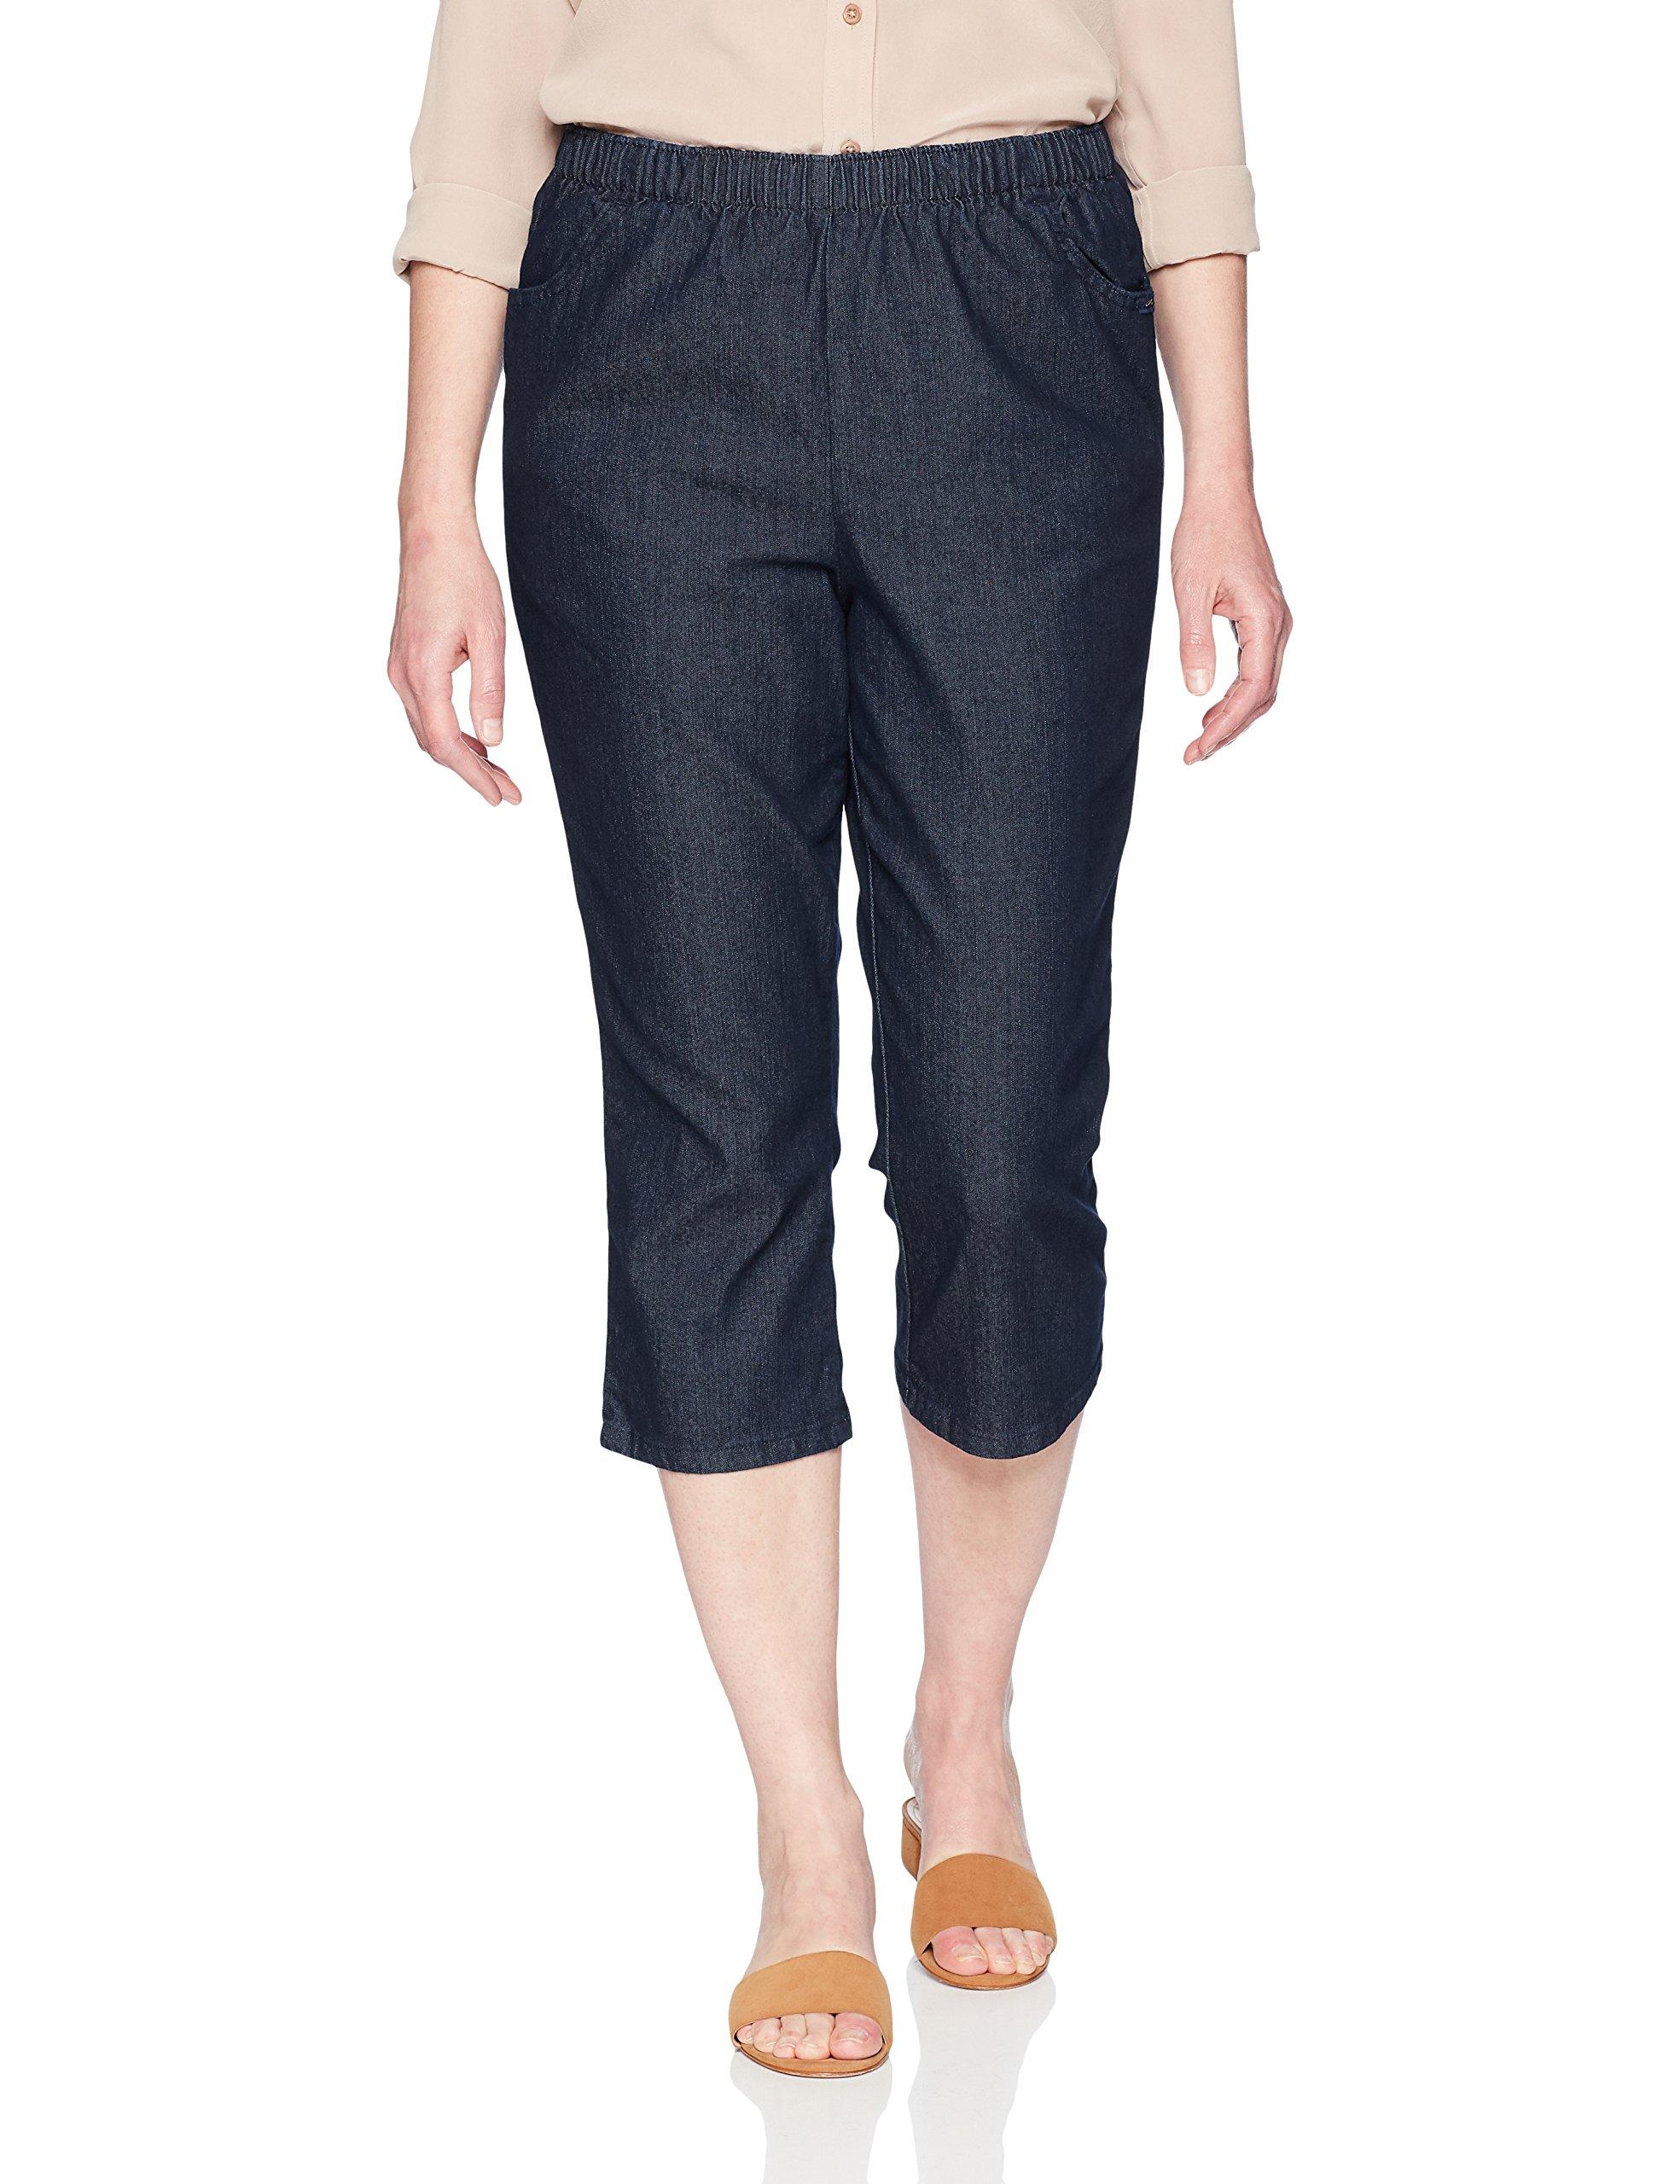 Chic Classic Collection Women's Plus Size Pull On Stretch Capri, Dark Shade, 22W